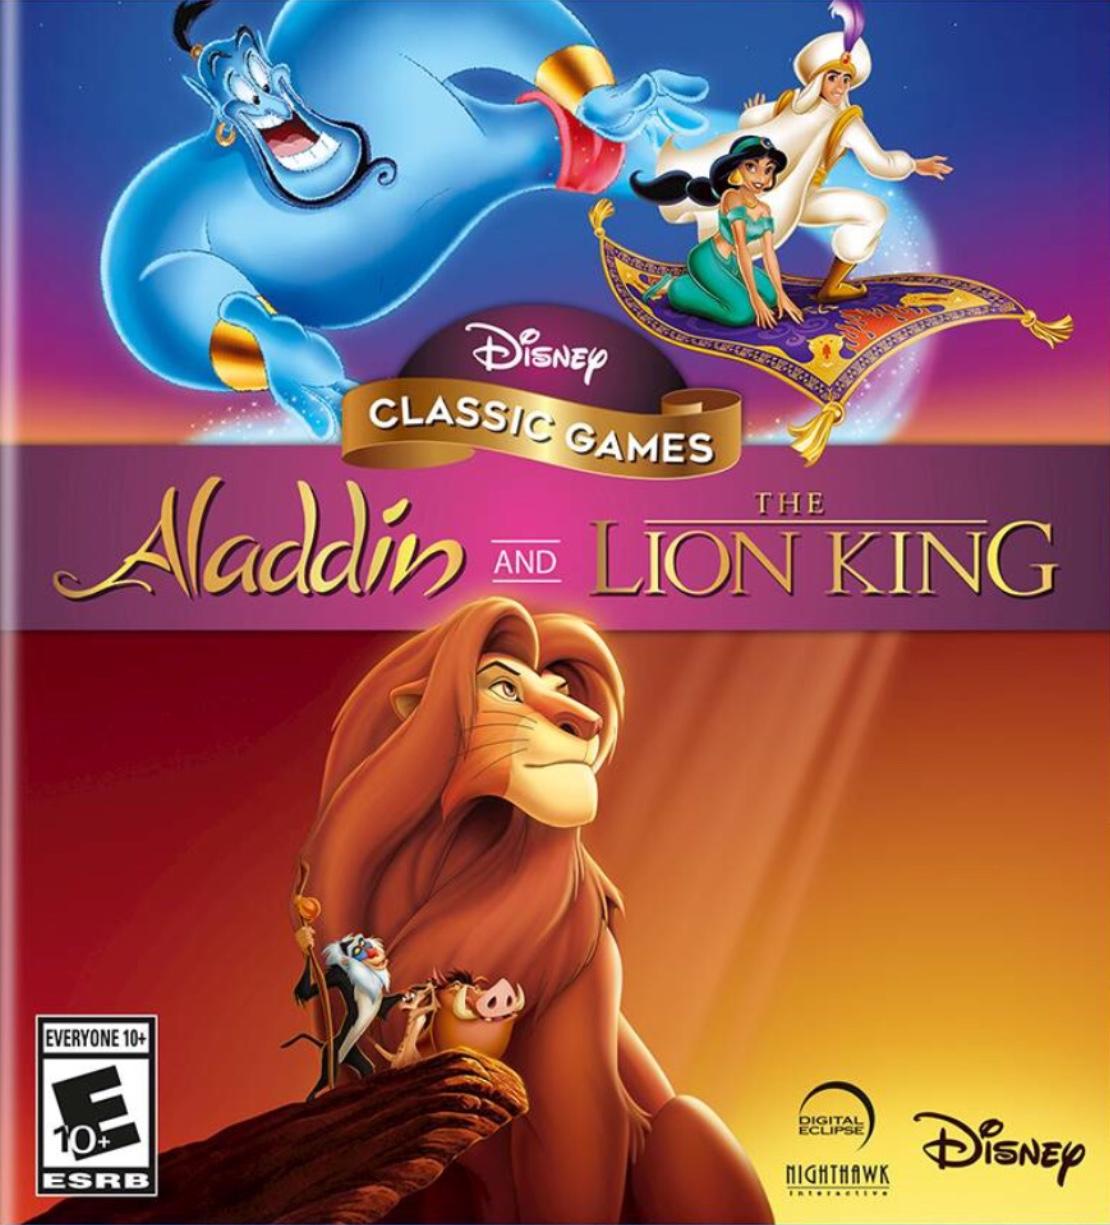 Disney Classic Games: Aladdin and The Lion King | Disney